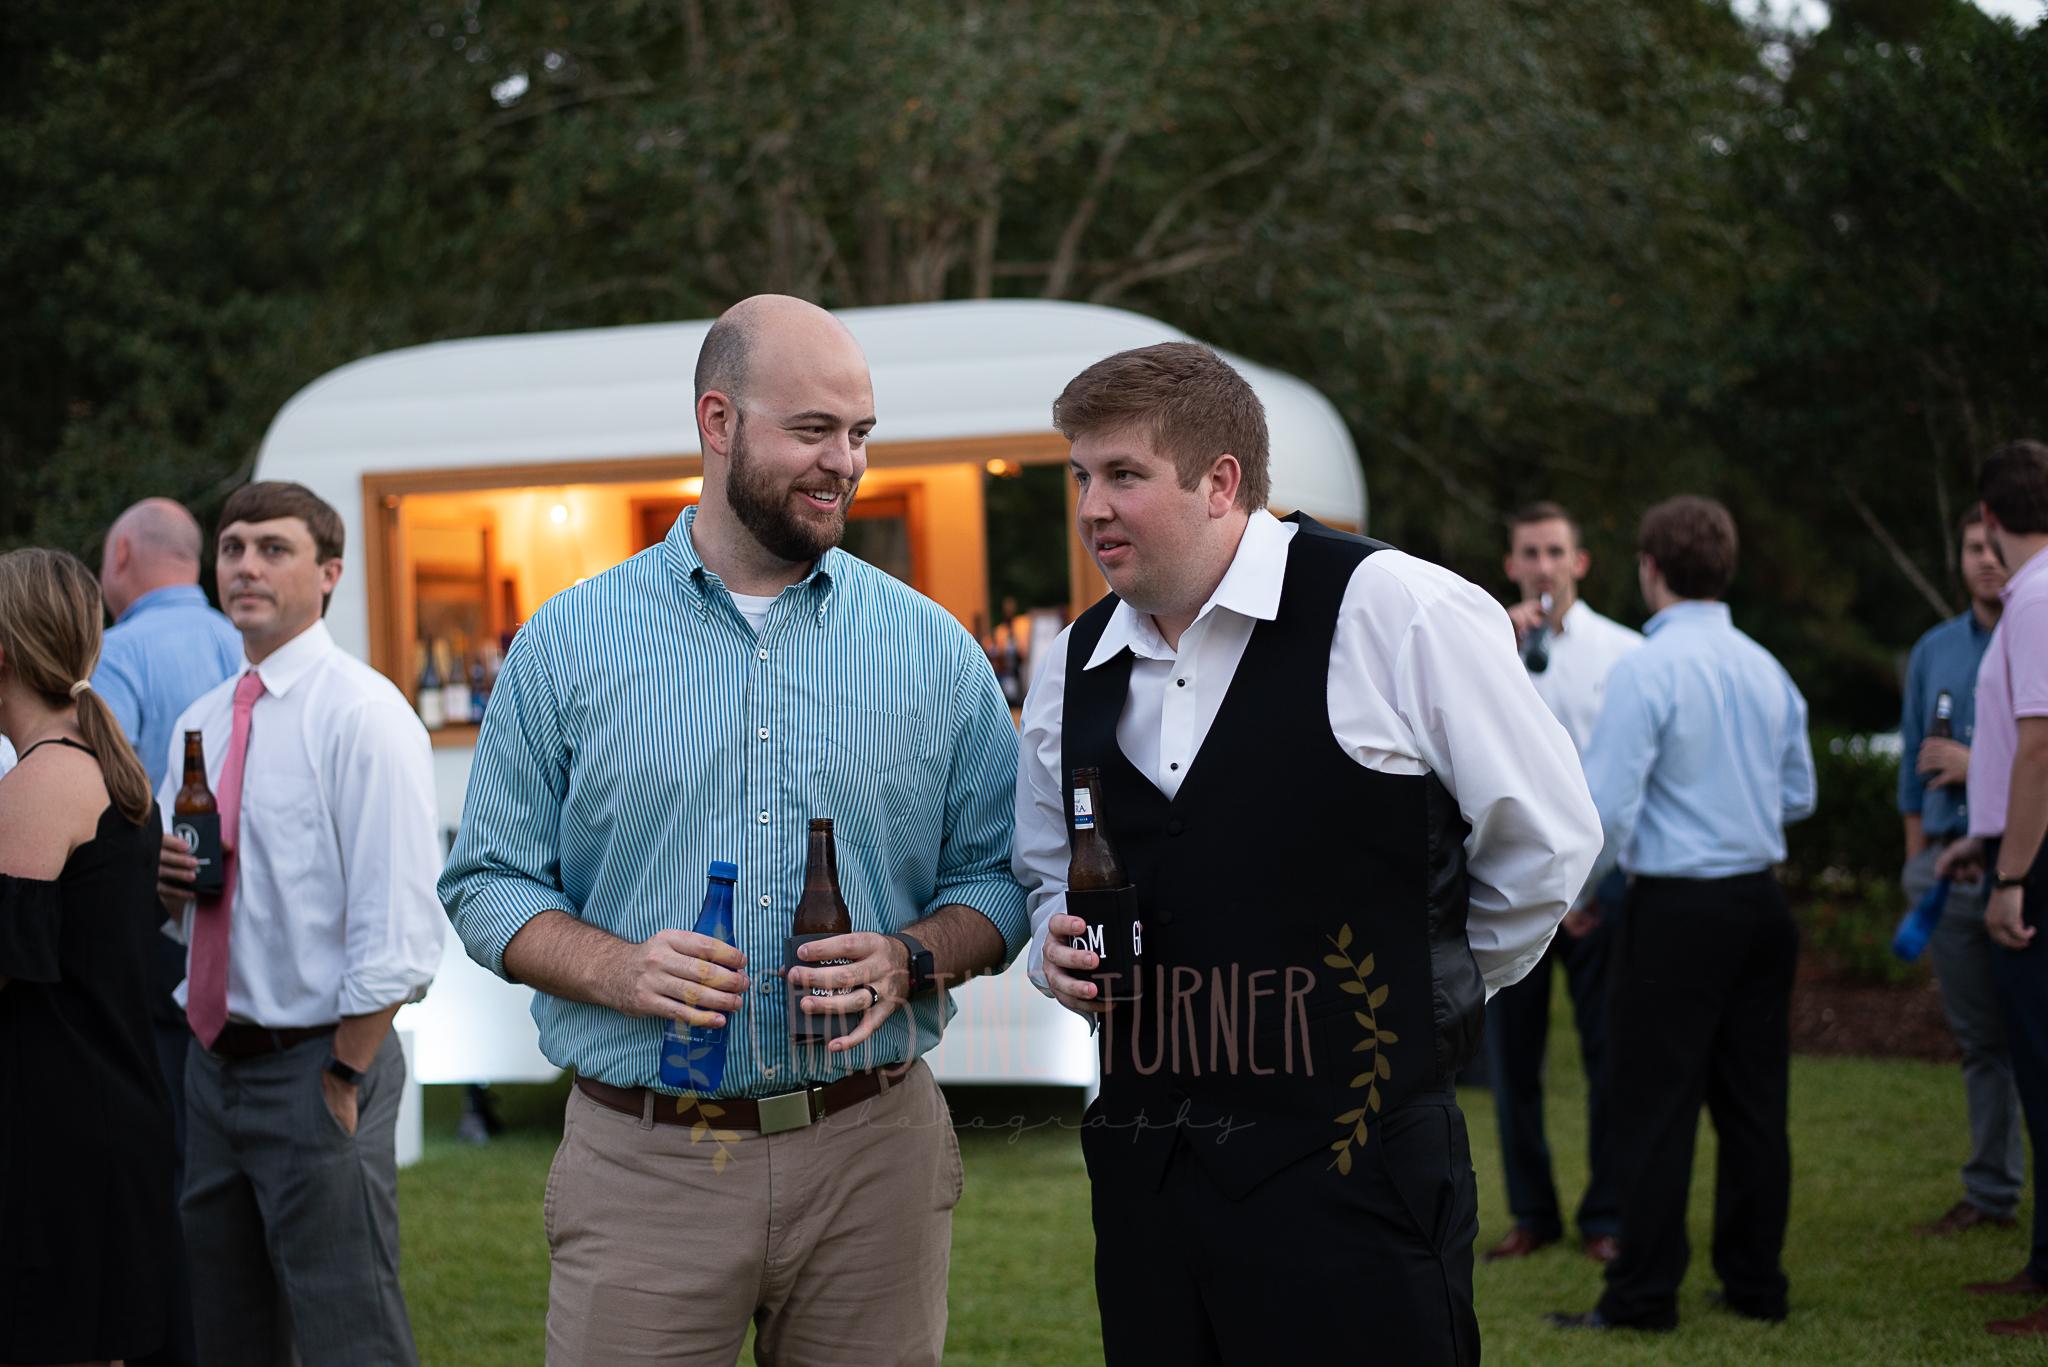 Miller Wedding (140 of 184)